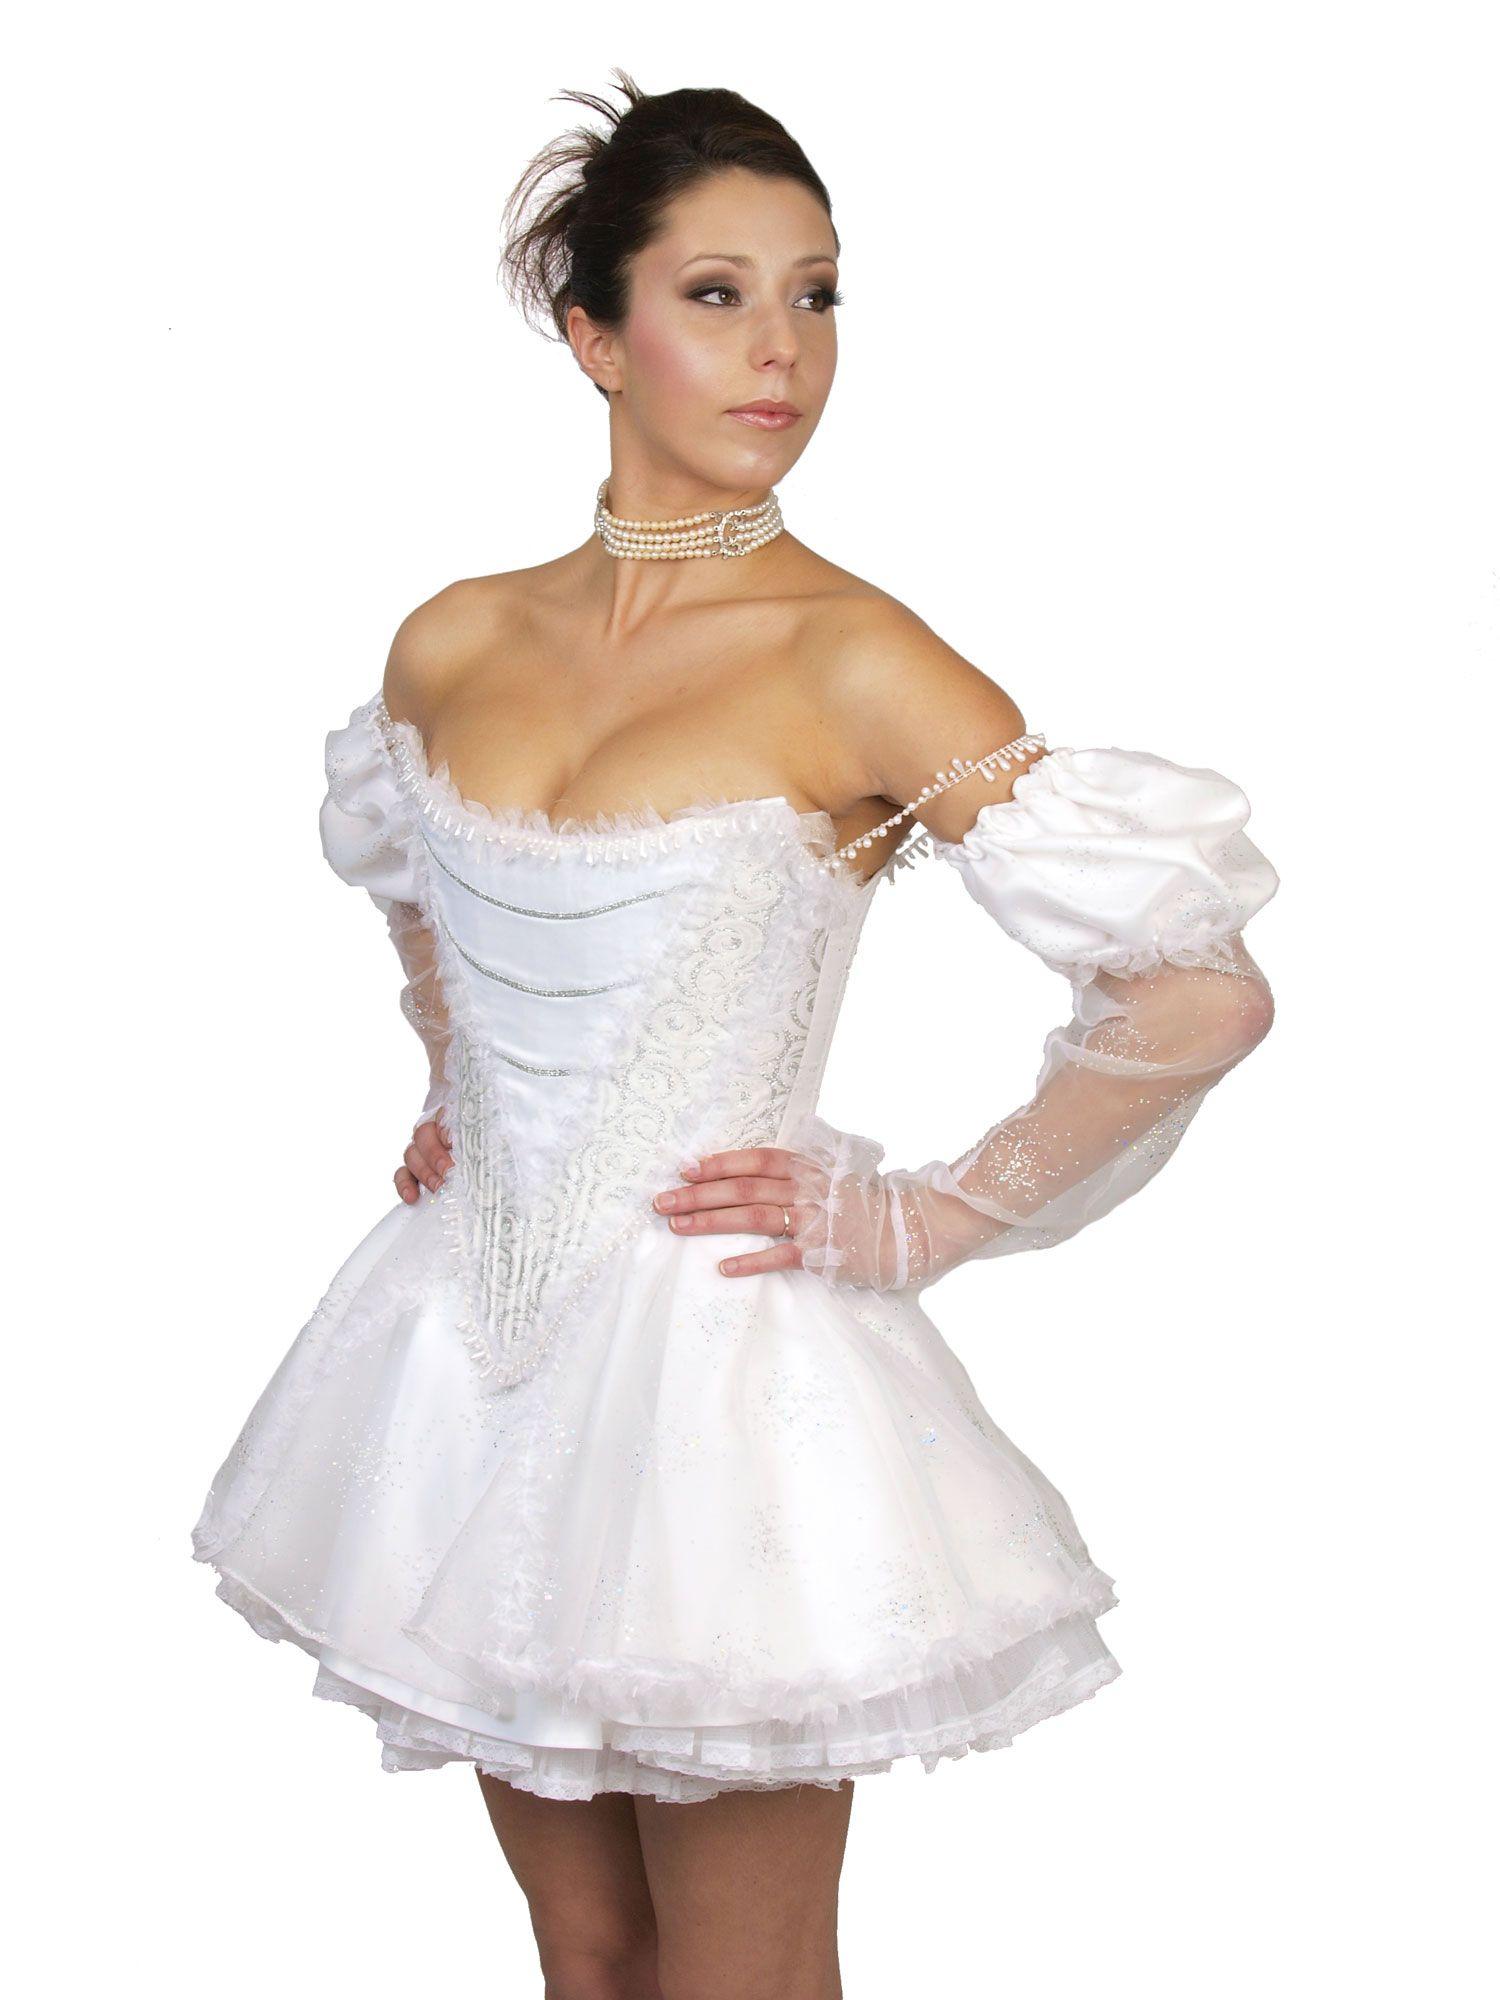 Alice in Wonderland White Queen Costume | Dance costumes ...